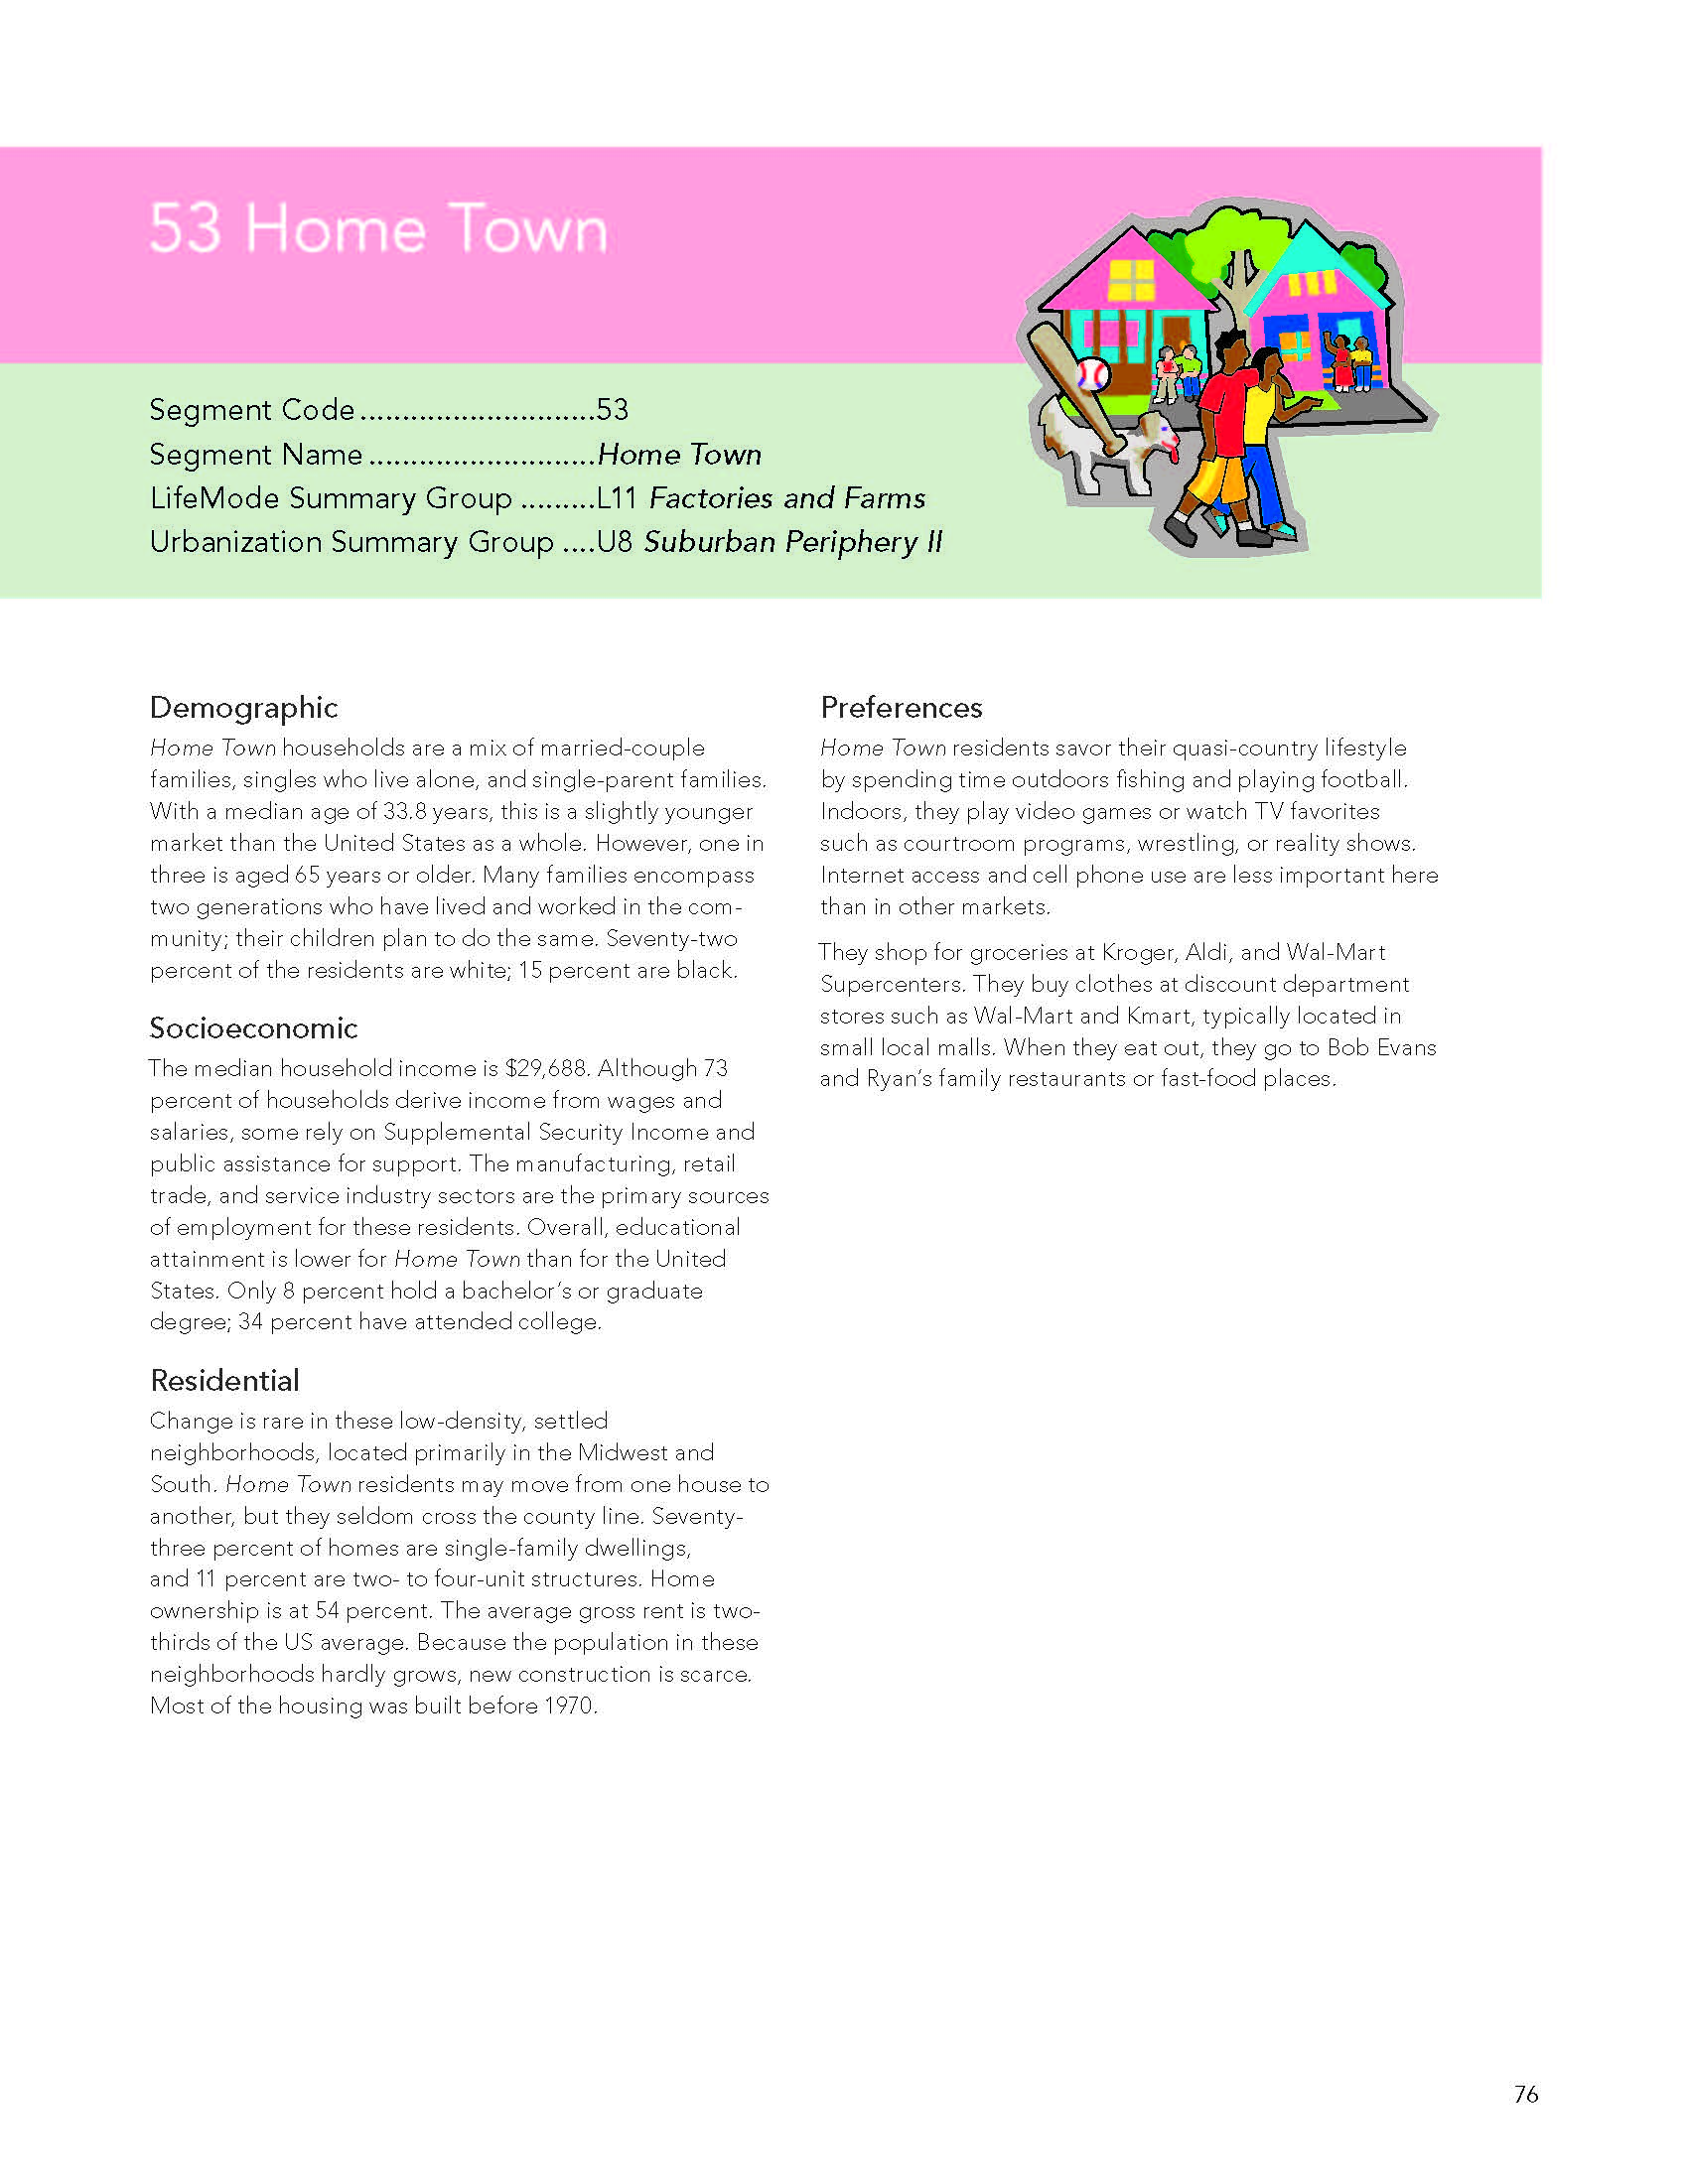 tapestry-segmentation_Page_79.jpg